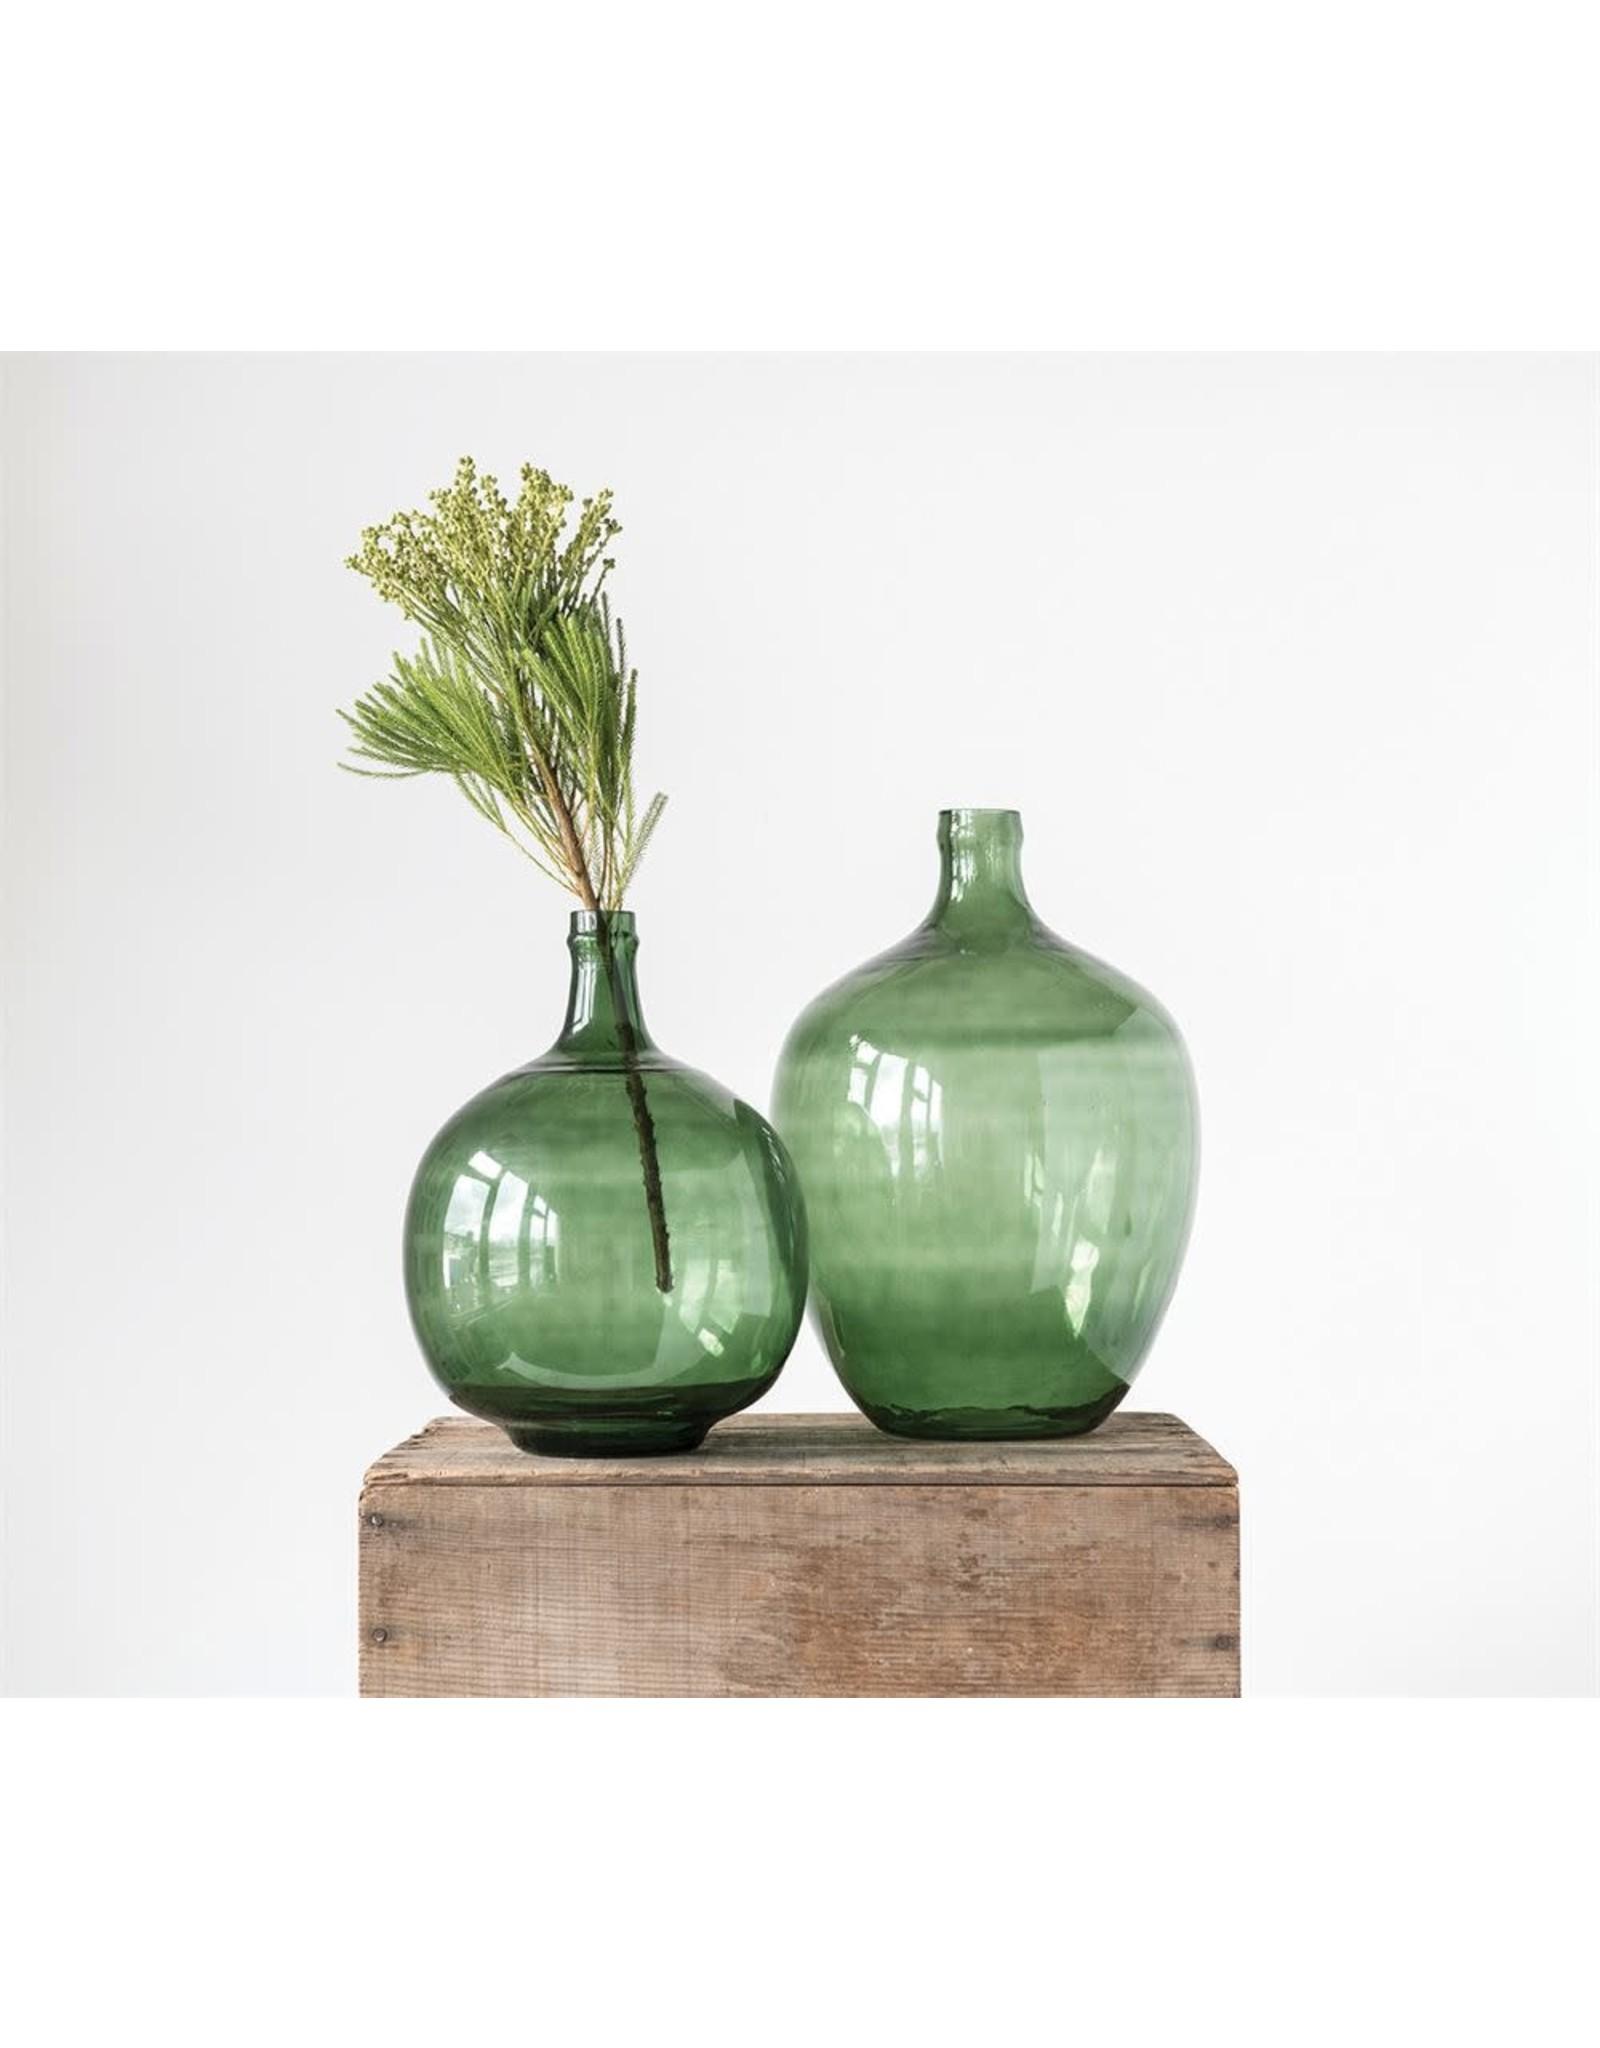 Vintage Reproduction Glass Bottle, Green